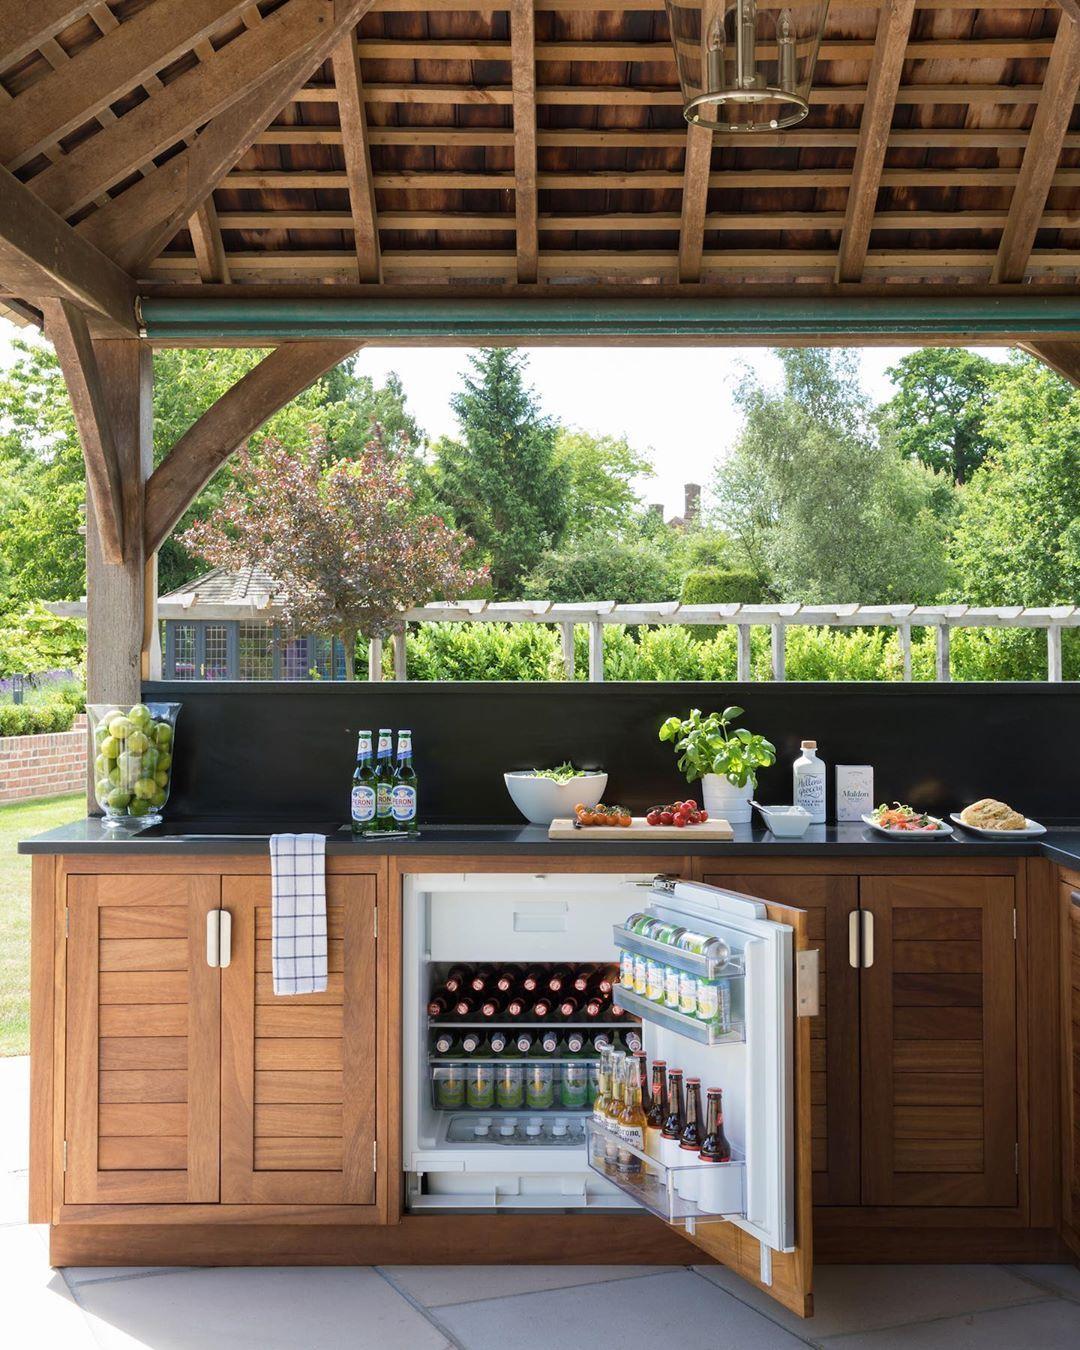 Wood Cabinet Doors Instead Of Stainless Steel For Outdoor Kitchen Modular Outdoor Kitchens Outdoor Kitchen Cabinets Wood Cabinet Doors